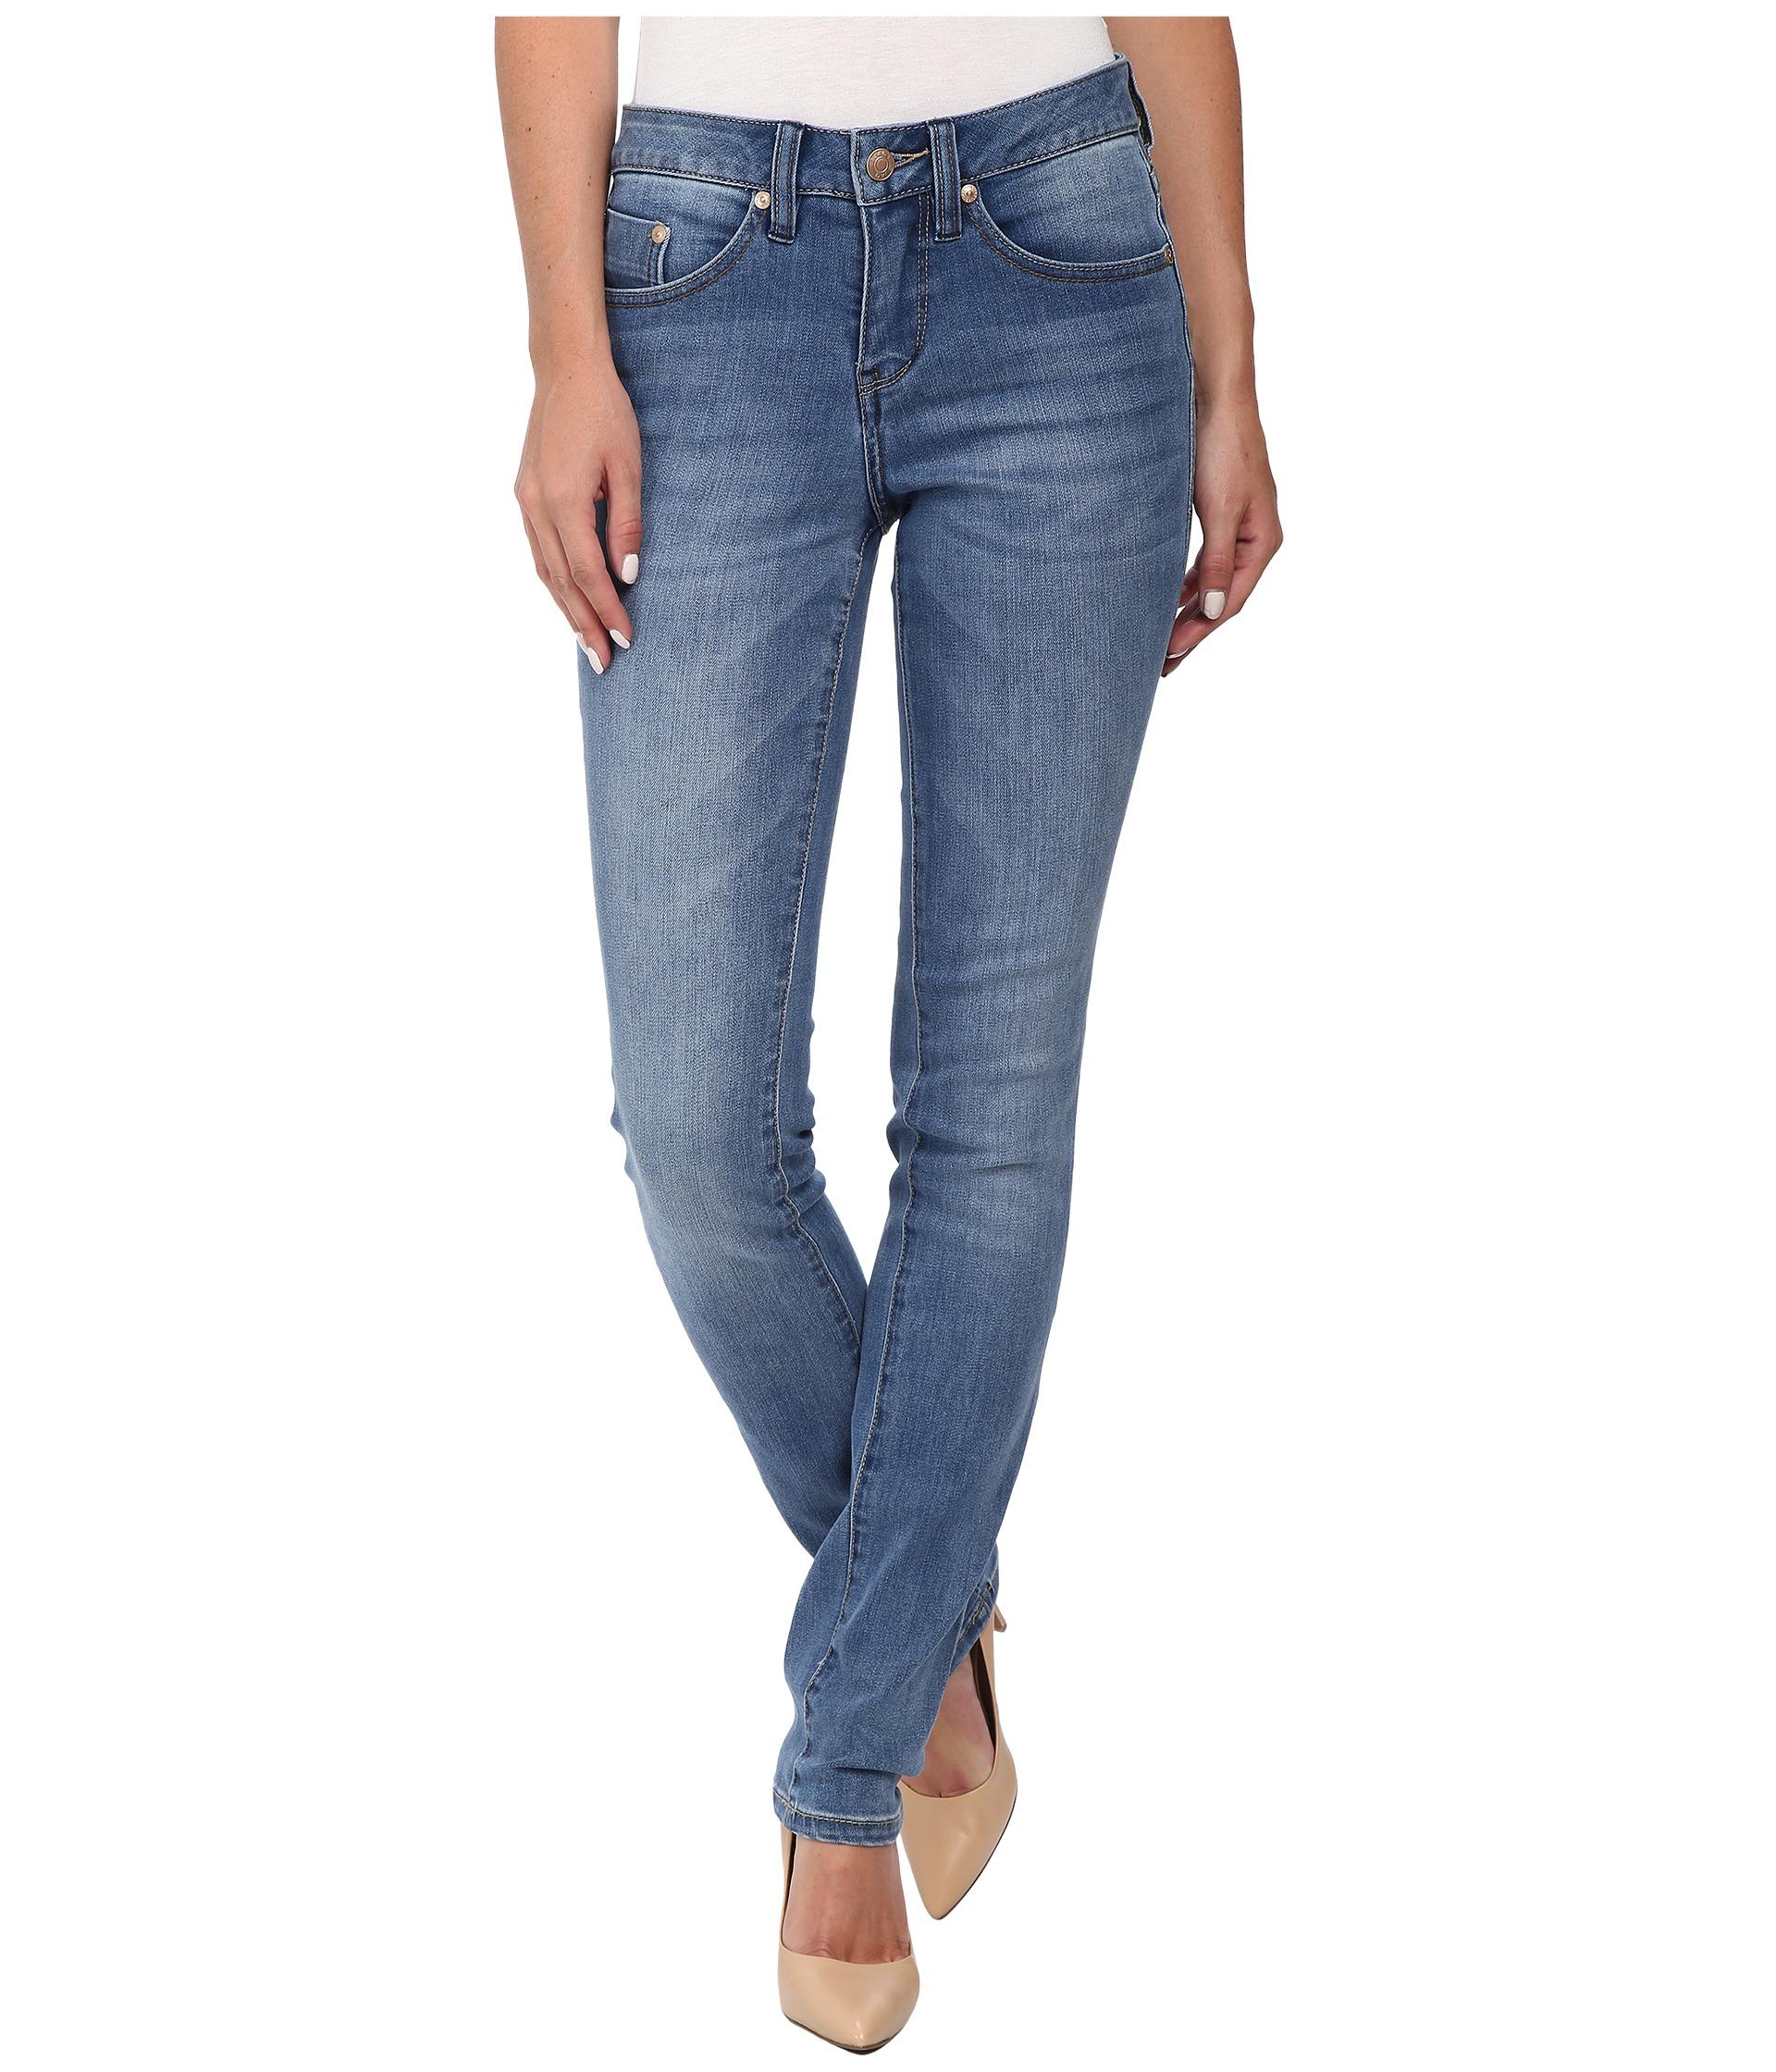 Lyst - Jag Jeans Hayward Mid Rise Slim Alpha Denim In Blue Water in Blue